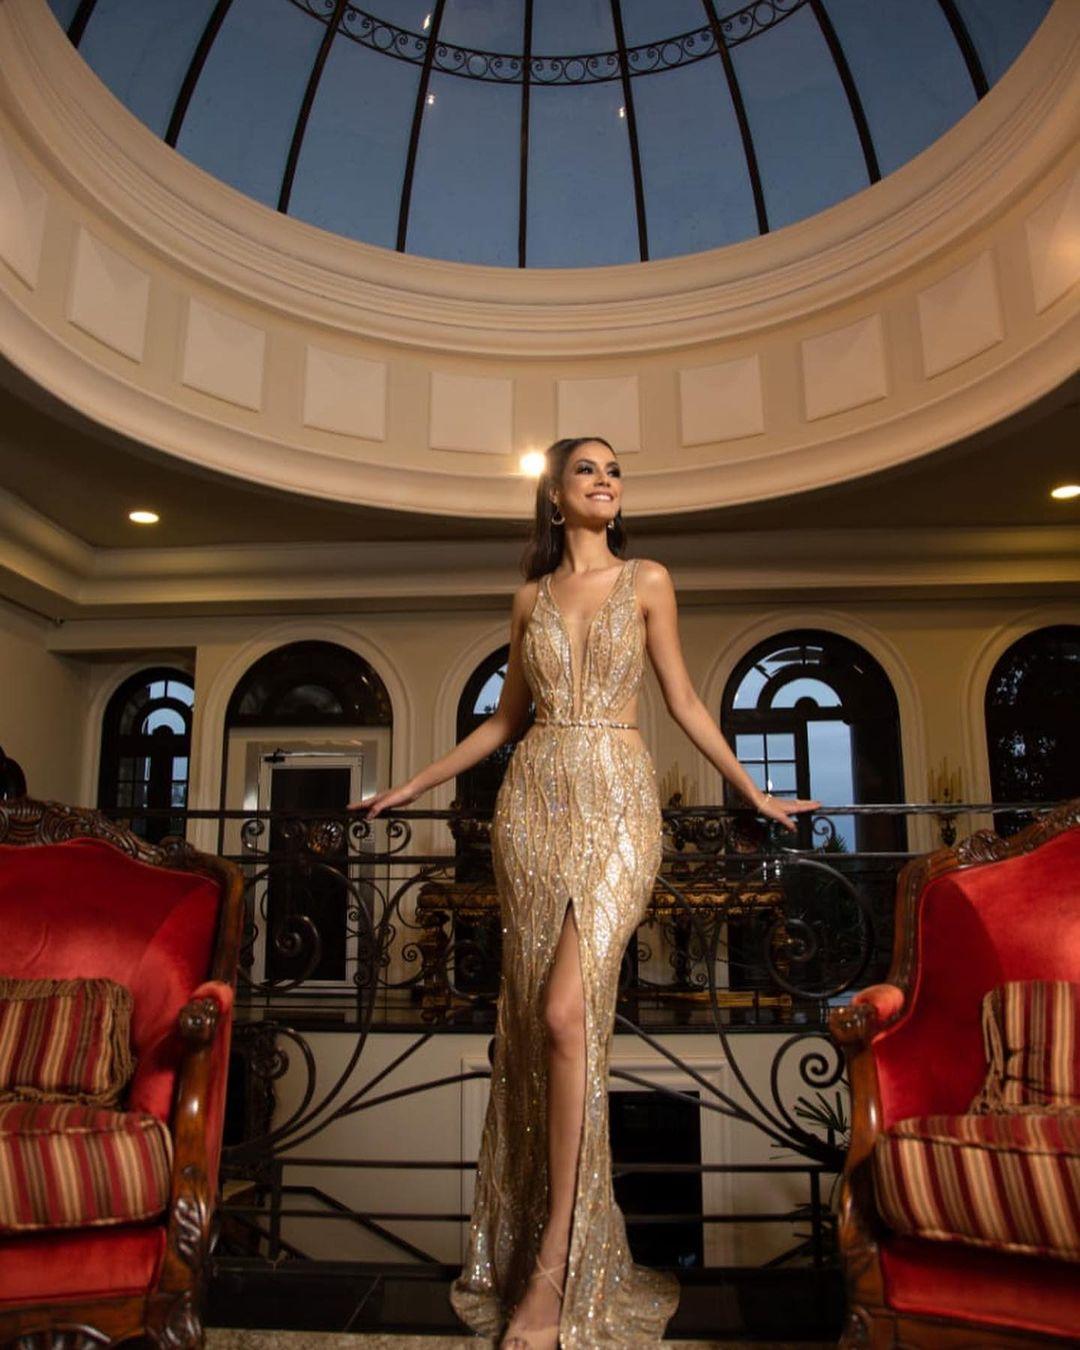 rafaella felipe, top 20 de miss brasil mundo 2019. - Página 8 69699911